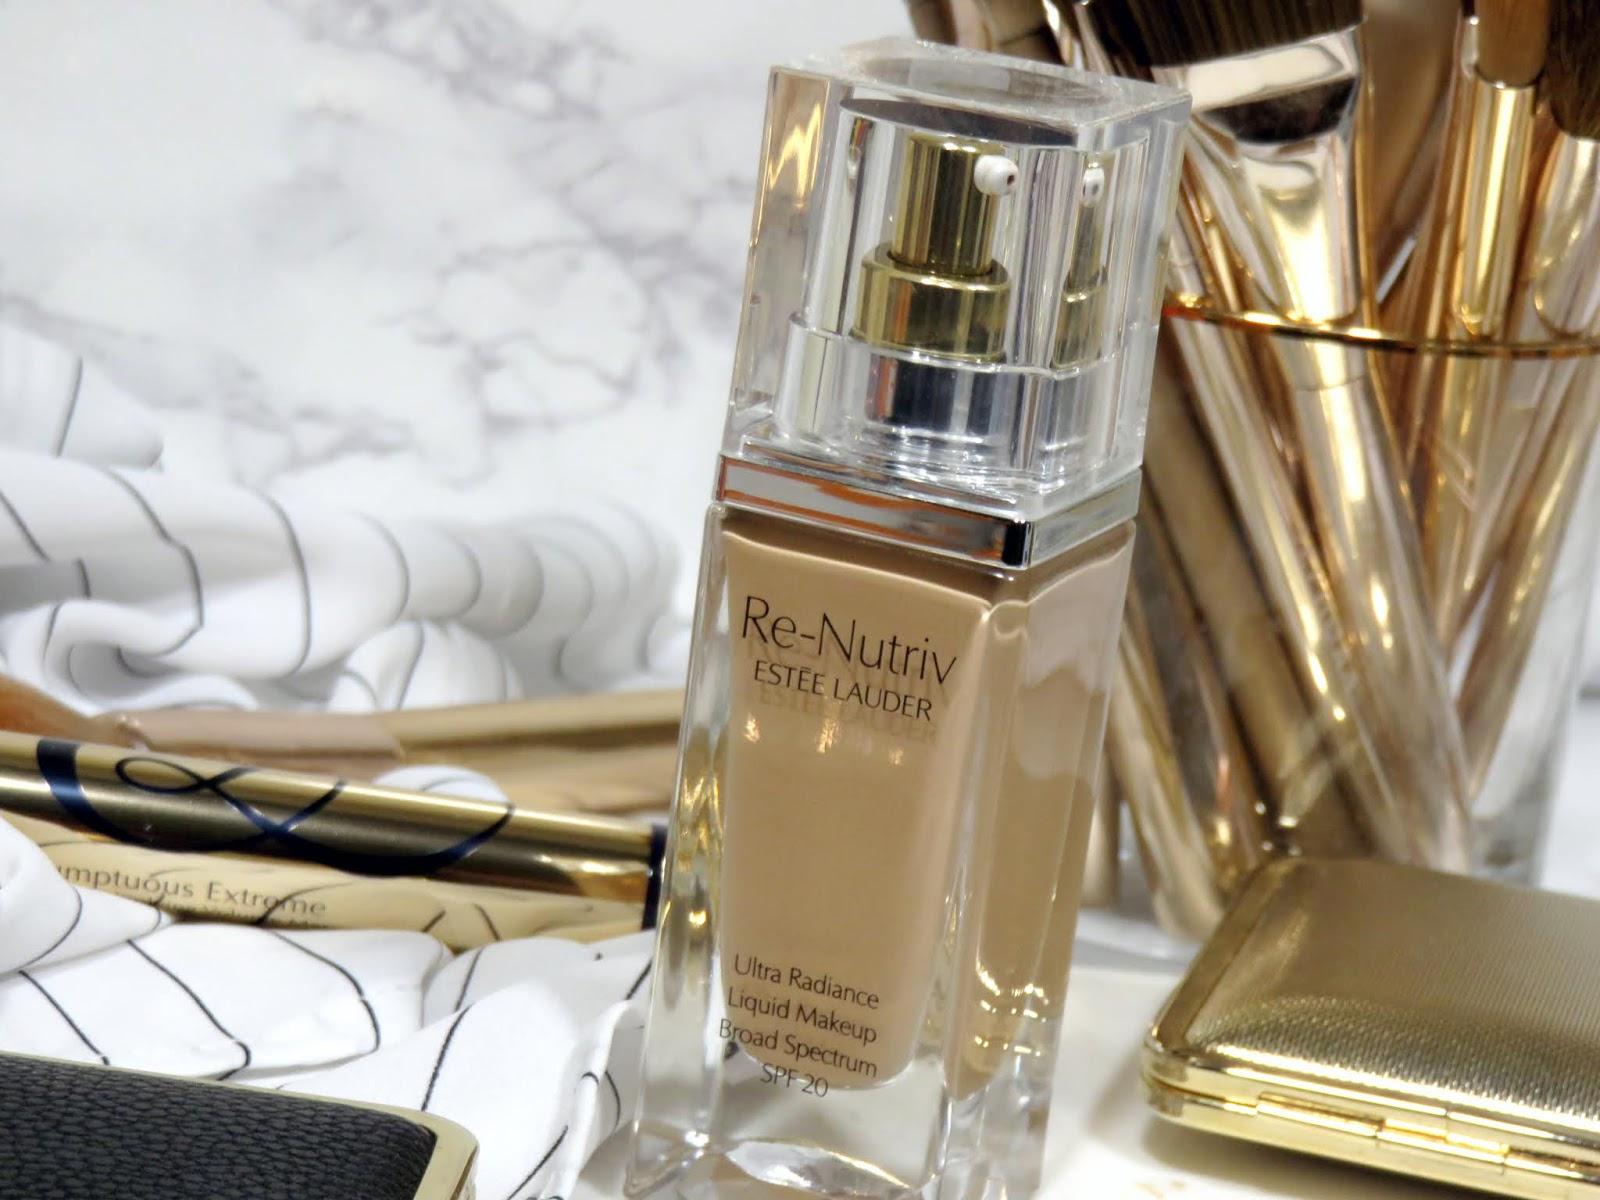 Estee Lauder Re-Nutriv Ultra Radiance Liquid Makeup